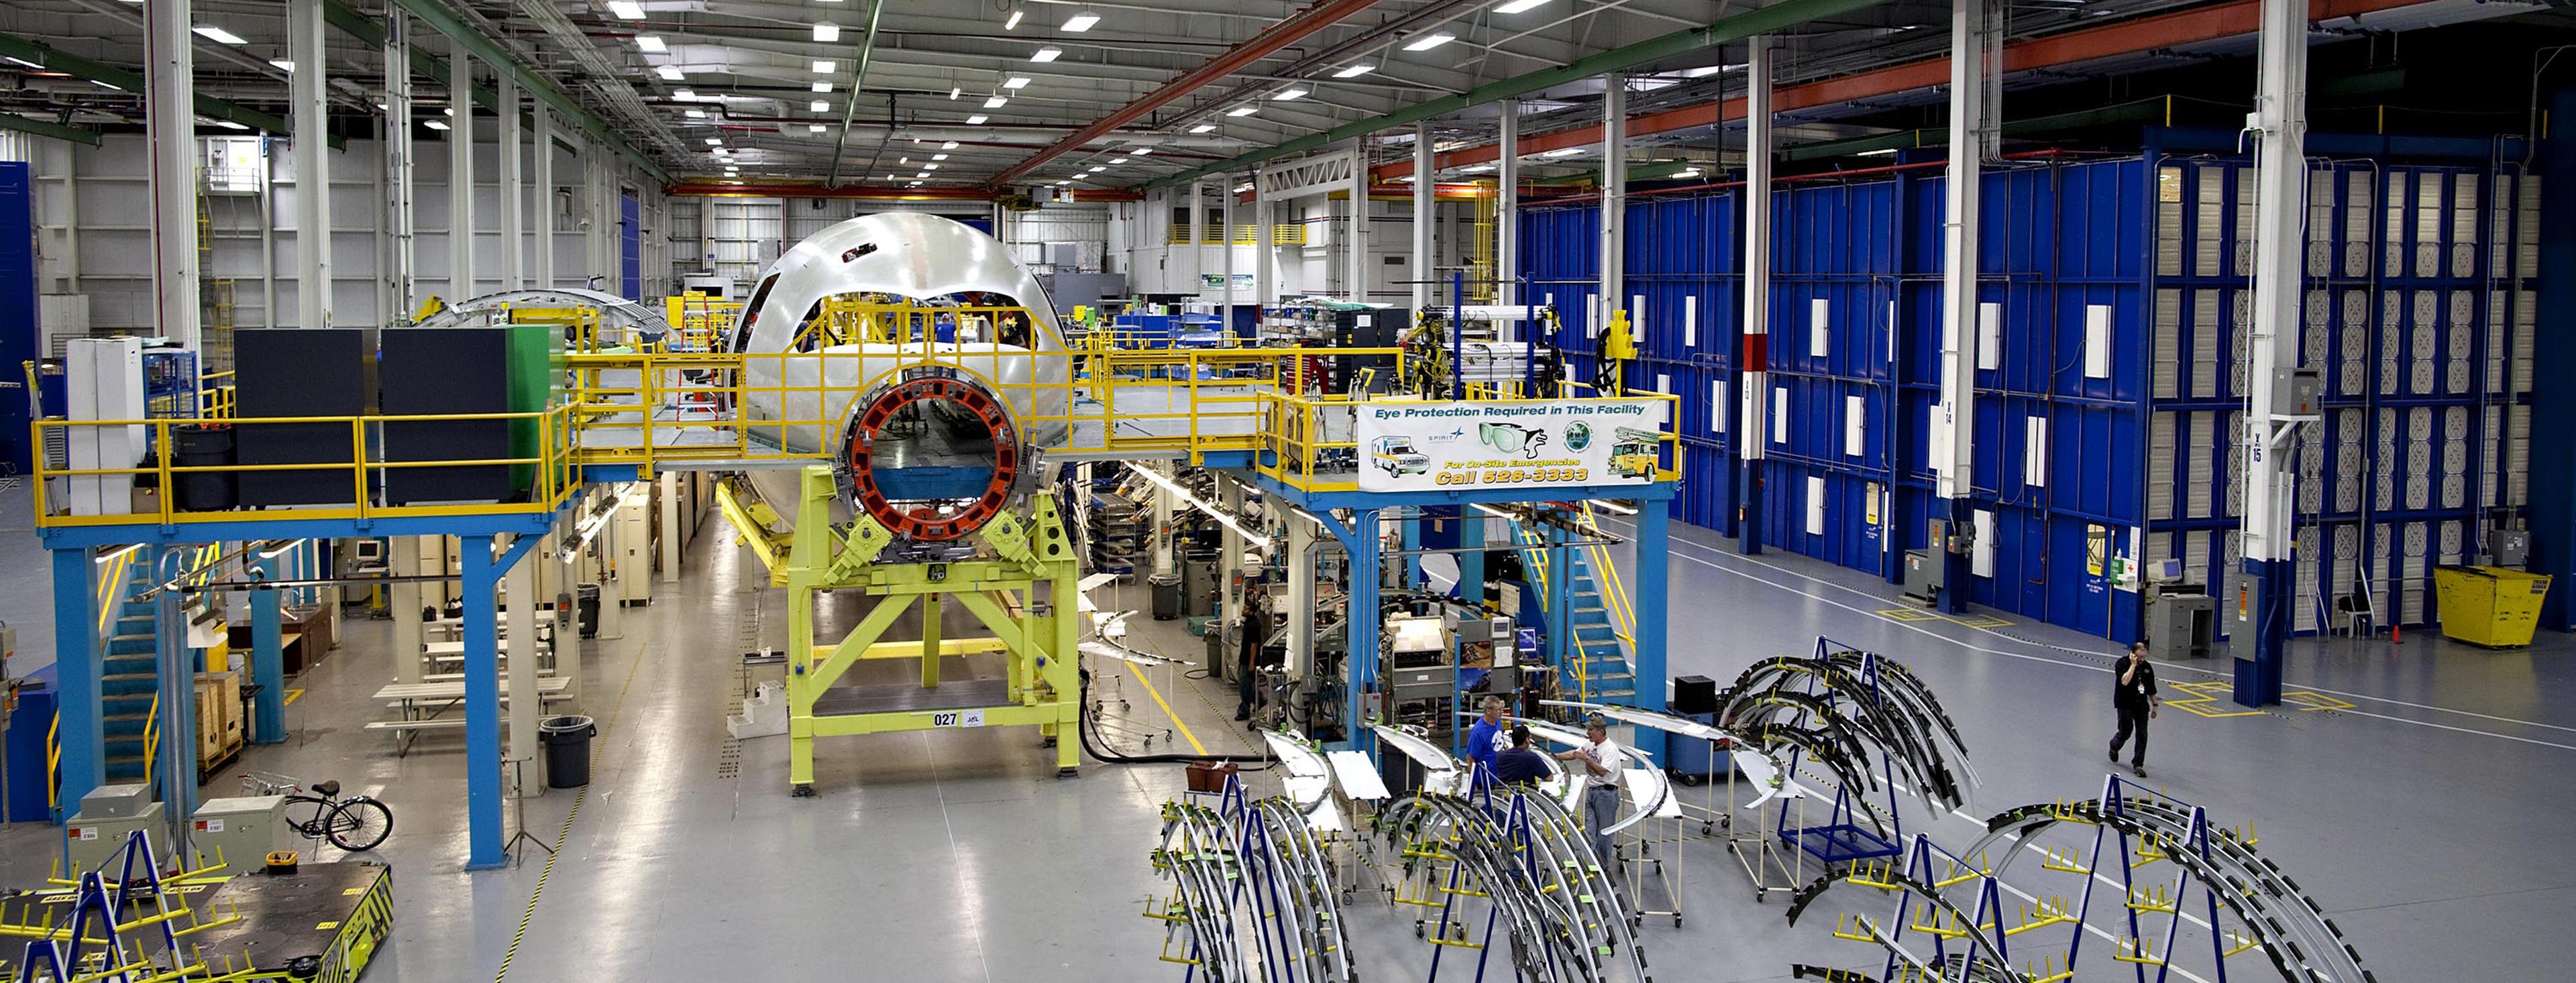 Boeing Rally Raises Doubt Dreamliner Justifies Profit Estimate